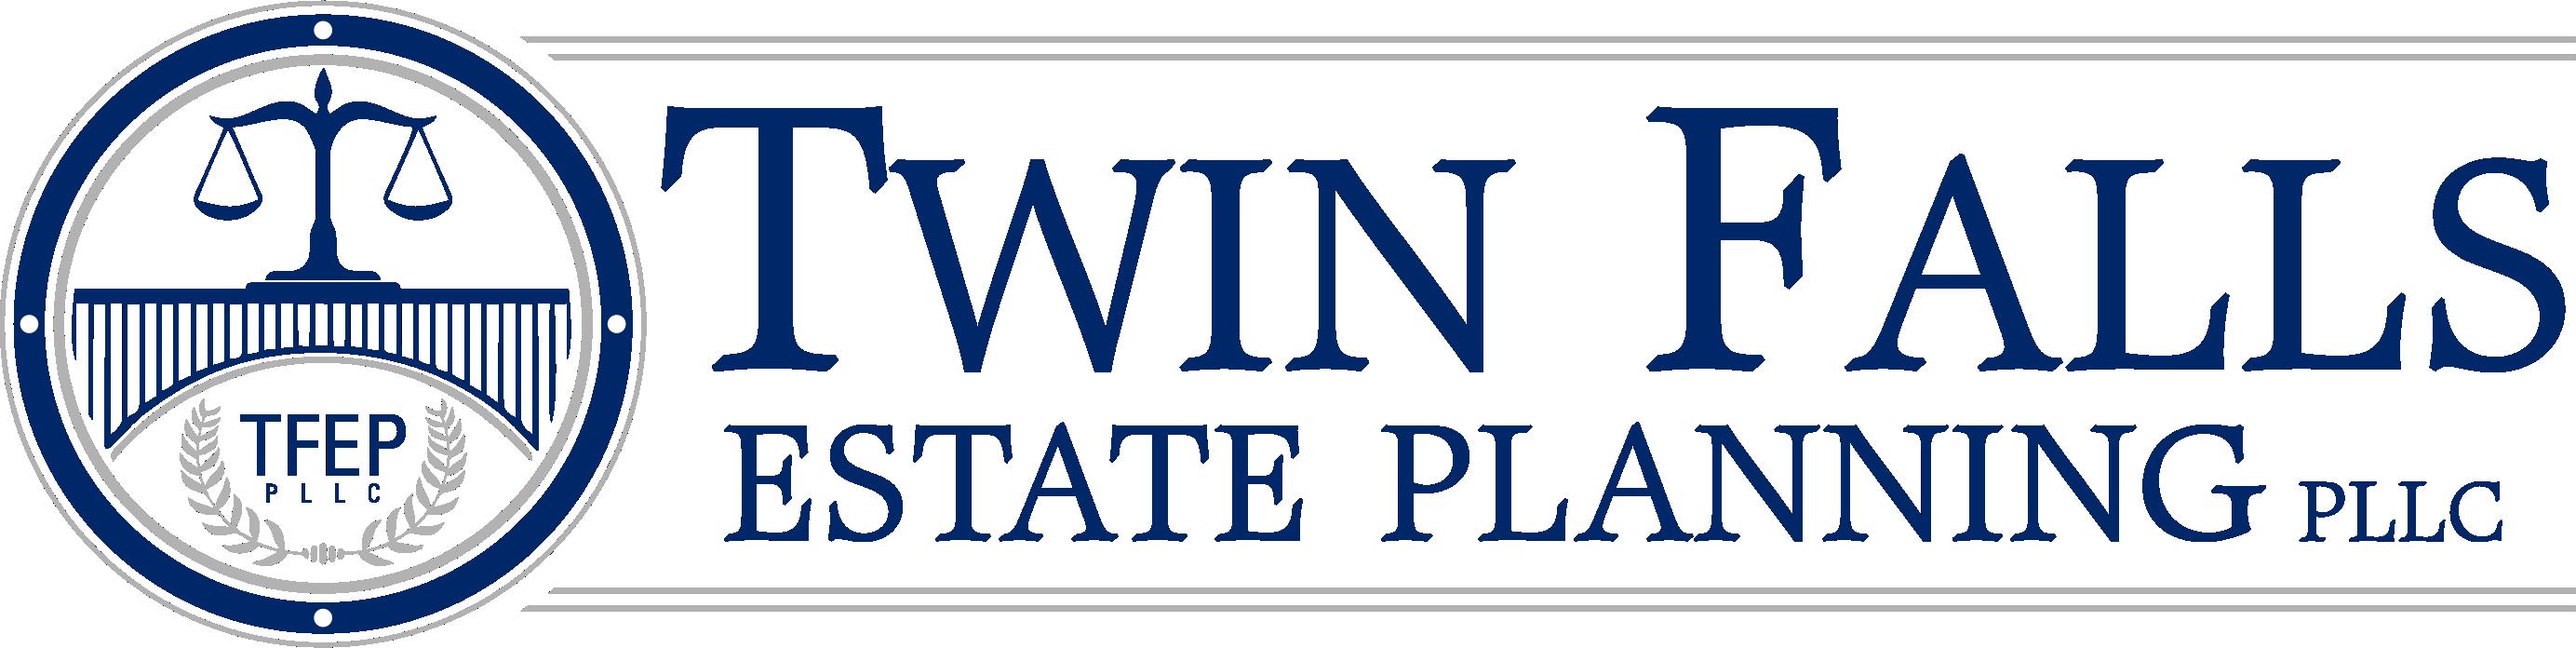 Twin Falls Estate Planning